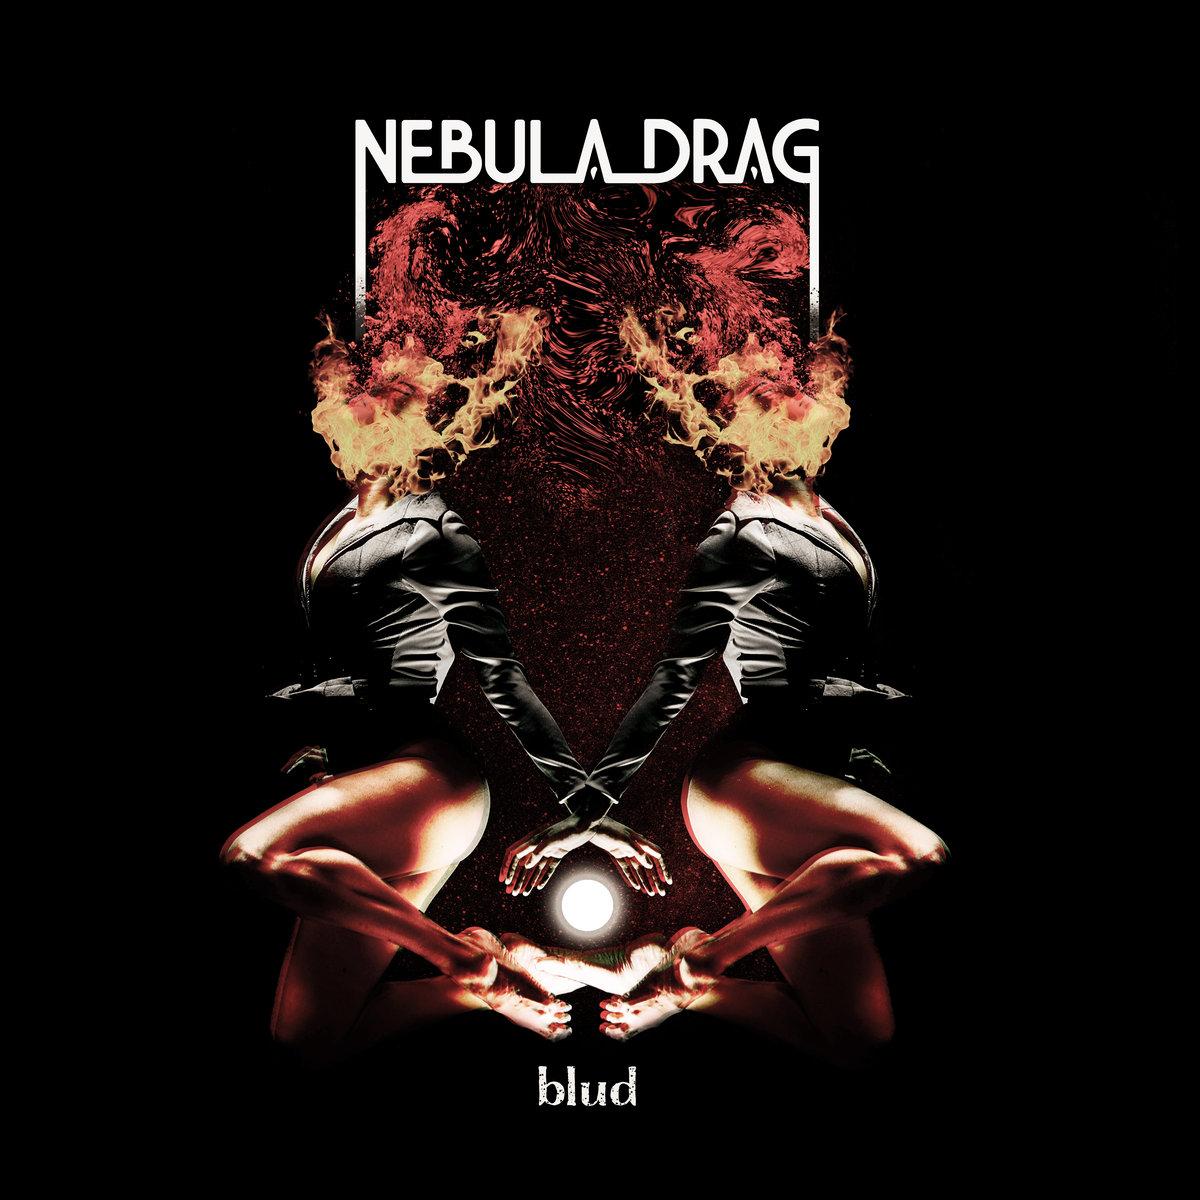 nebula drag blud